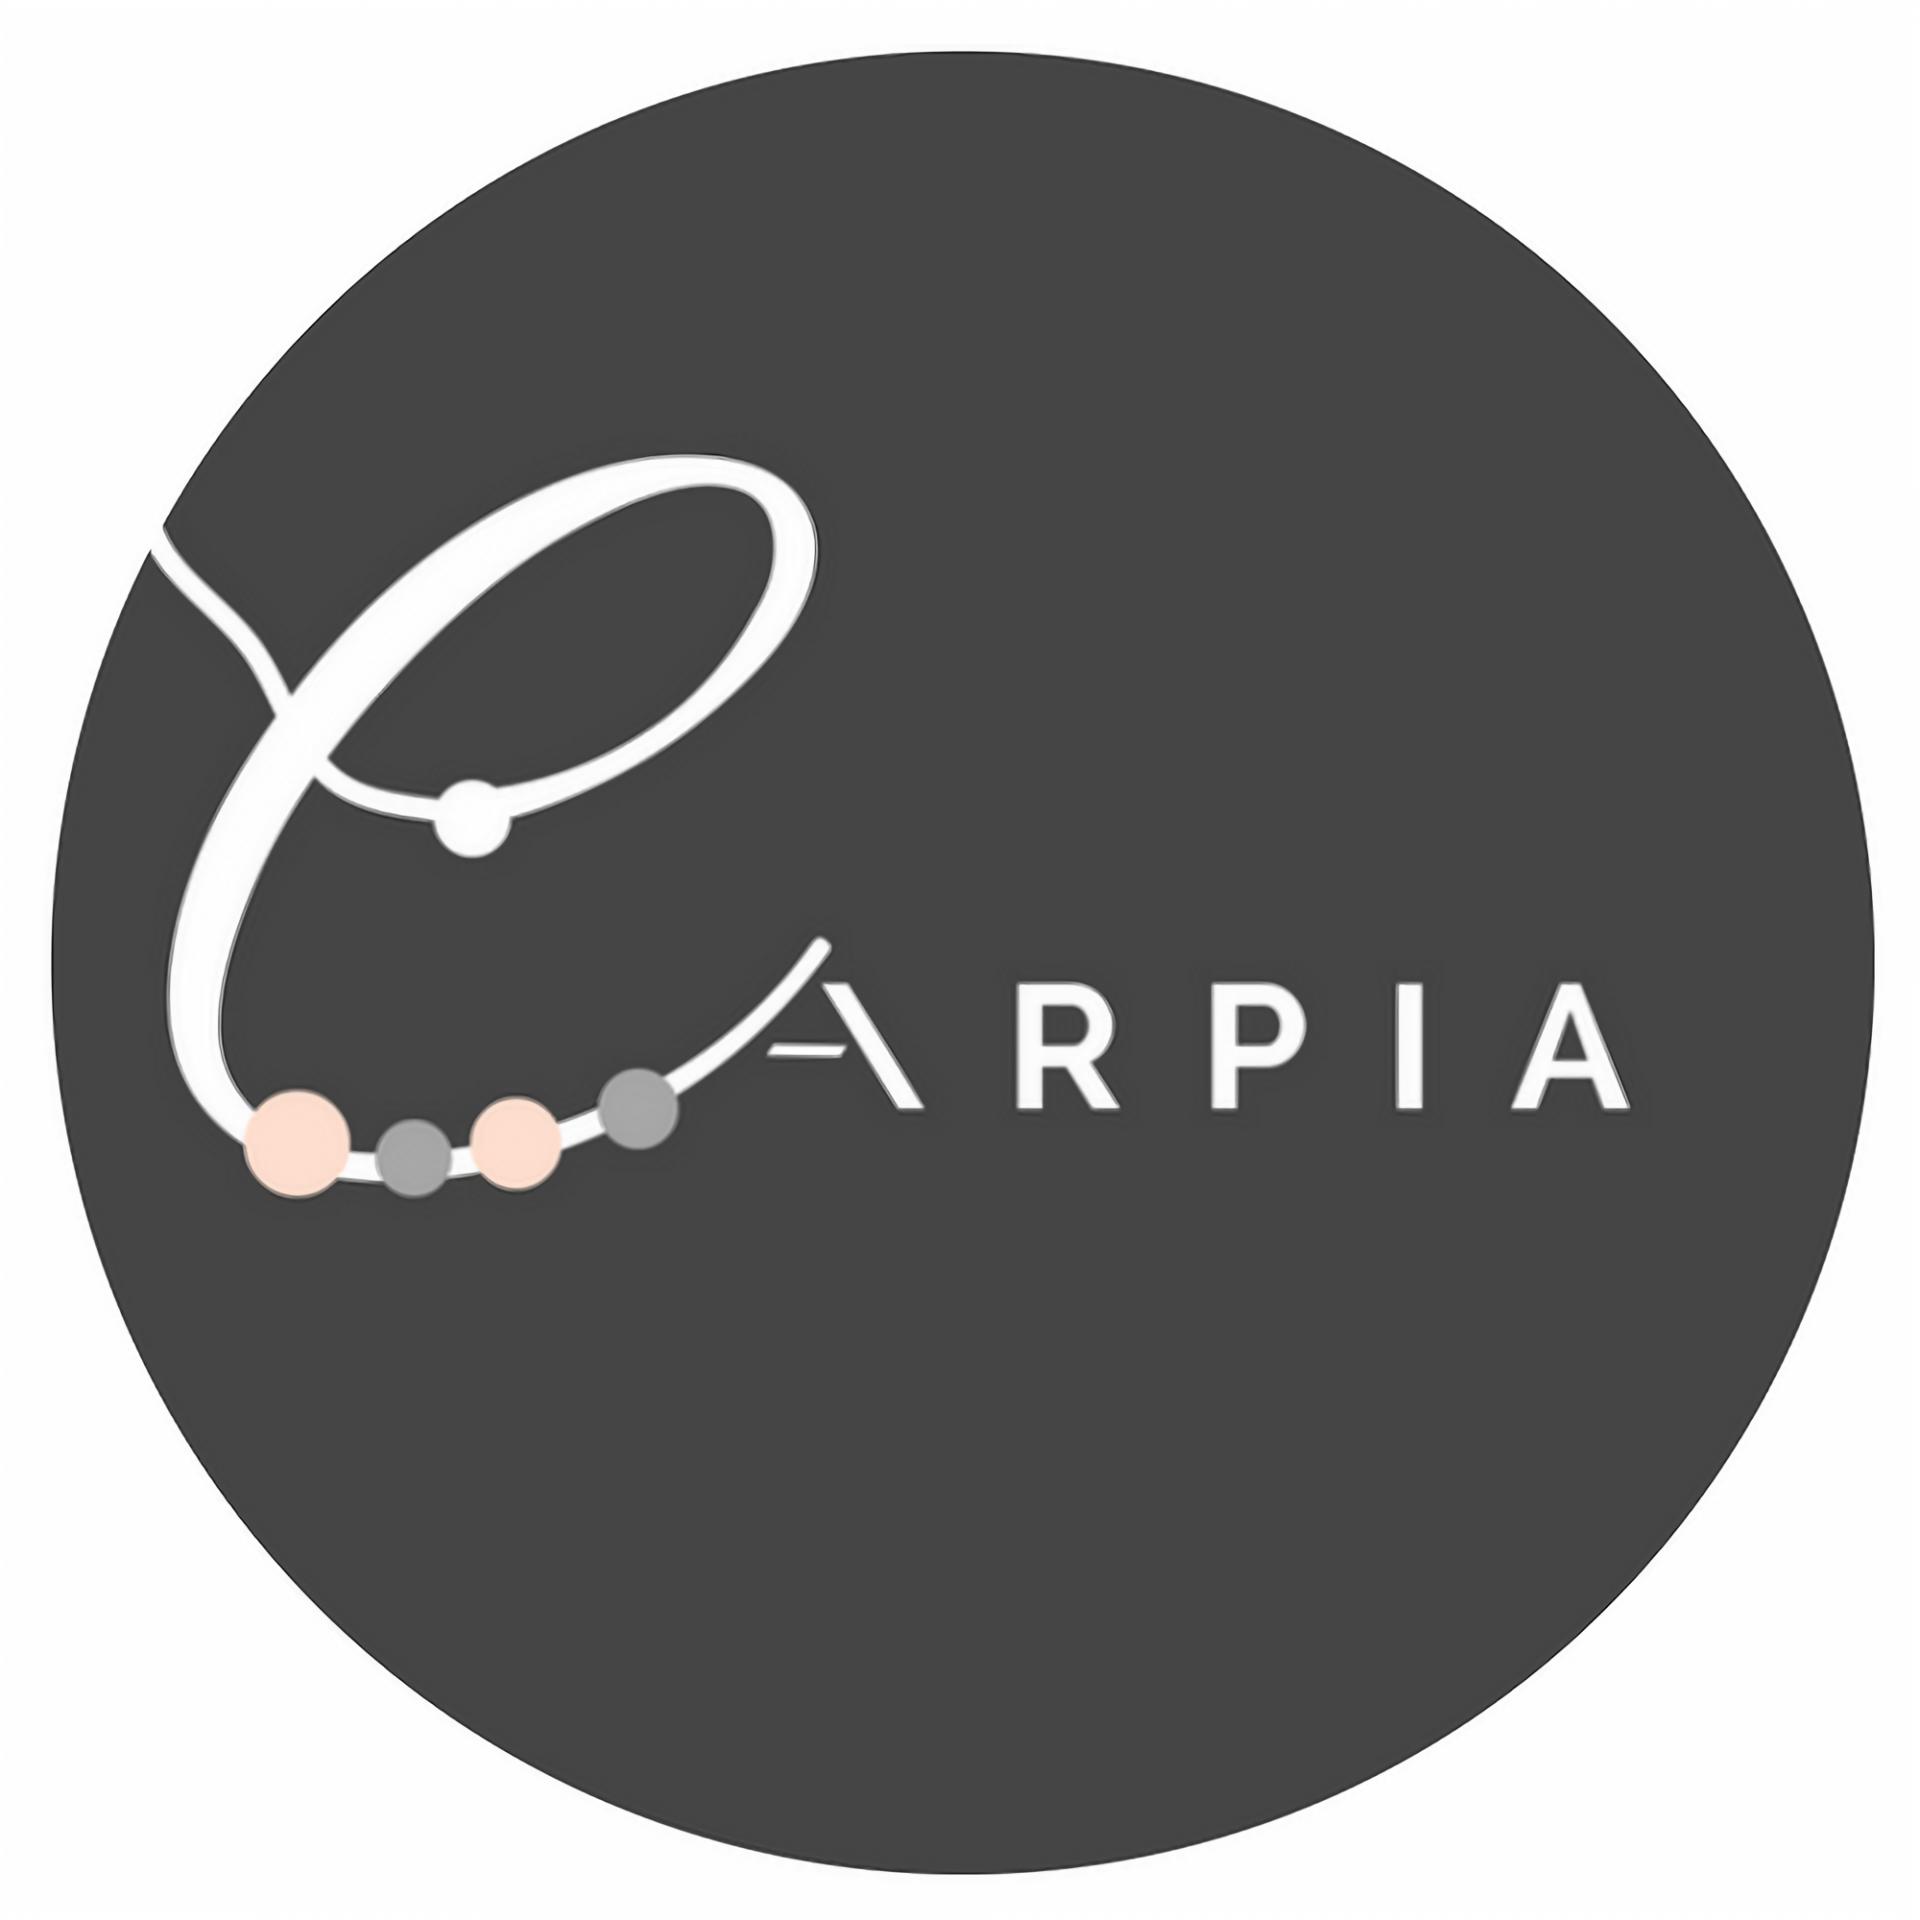 Carpia&MiniCarpia